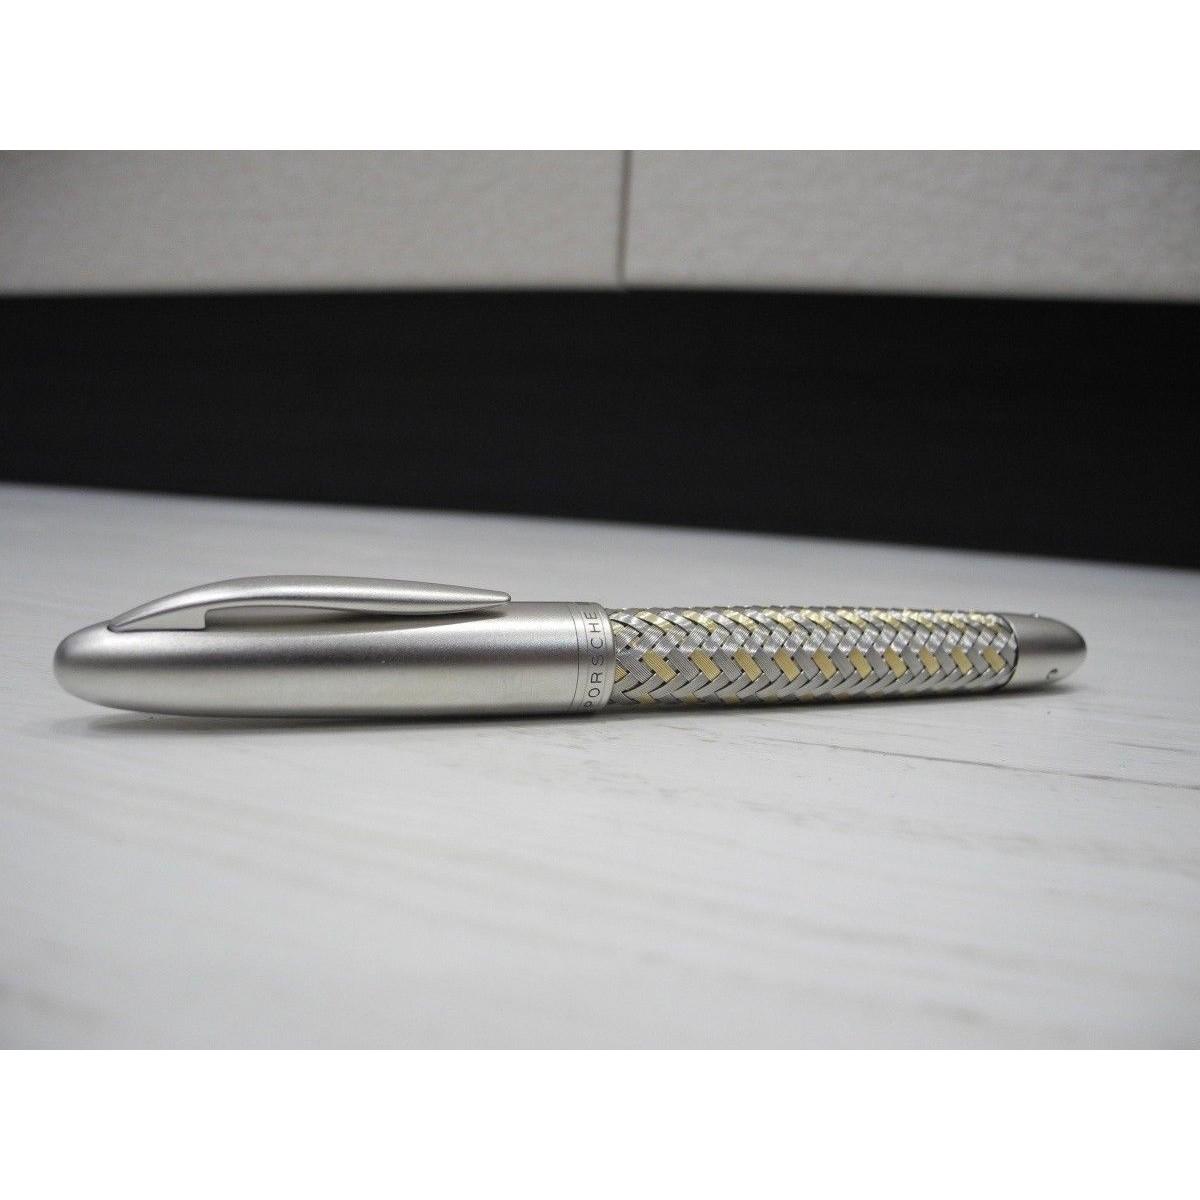 porsche pen refill